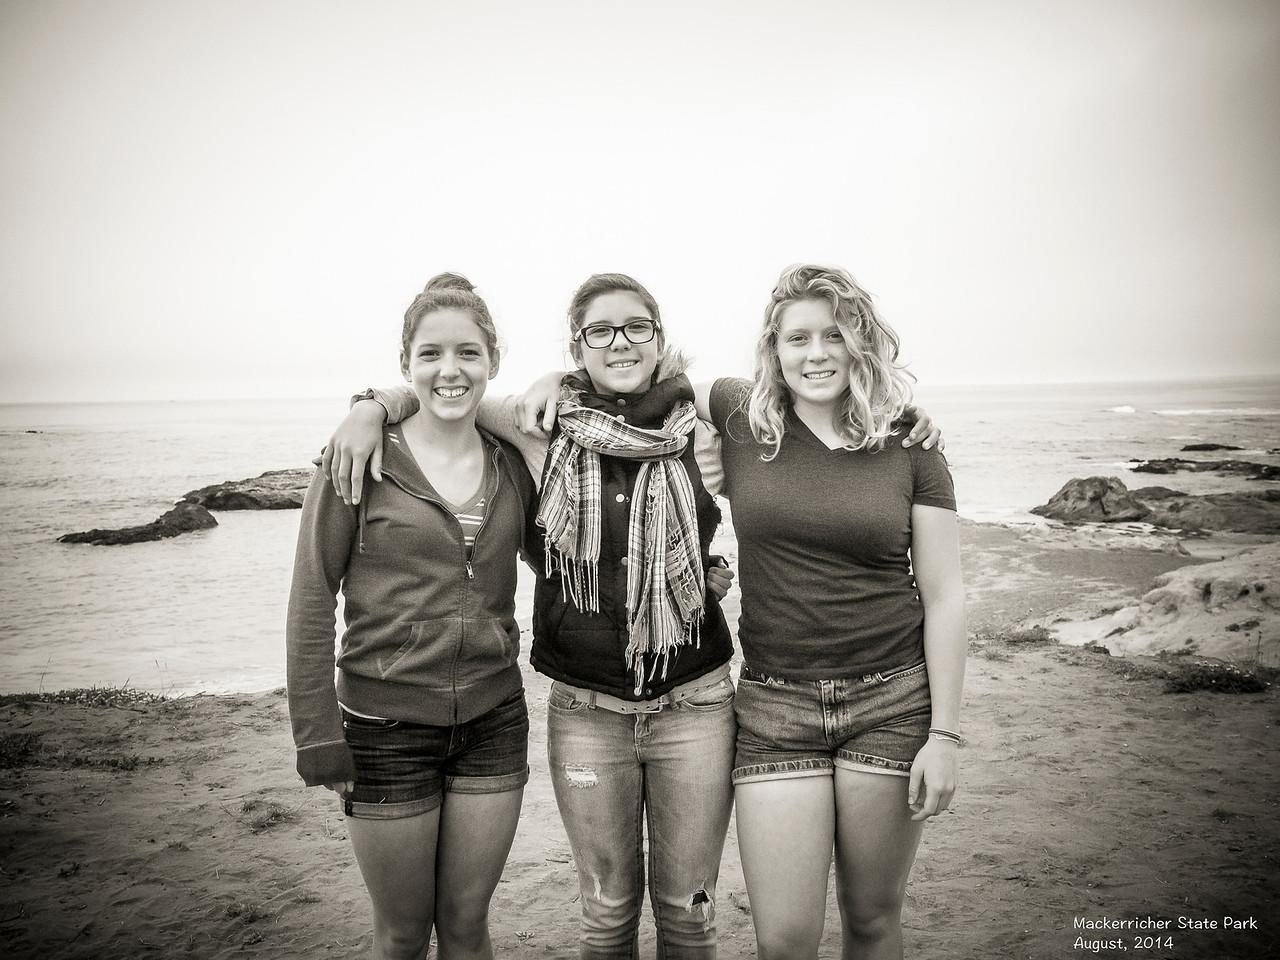 Sisters - MacKerricher State Beach, August, 2014